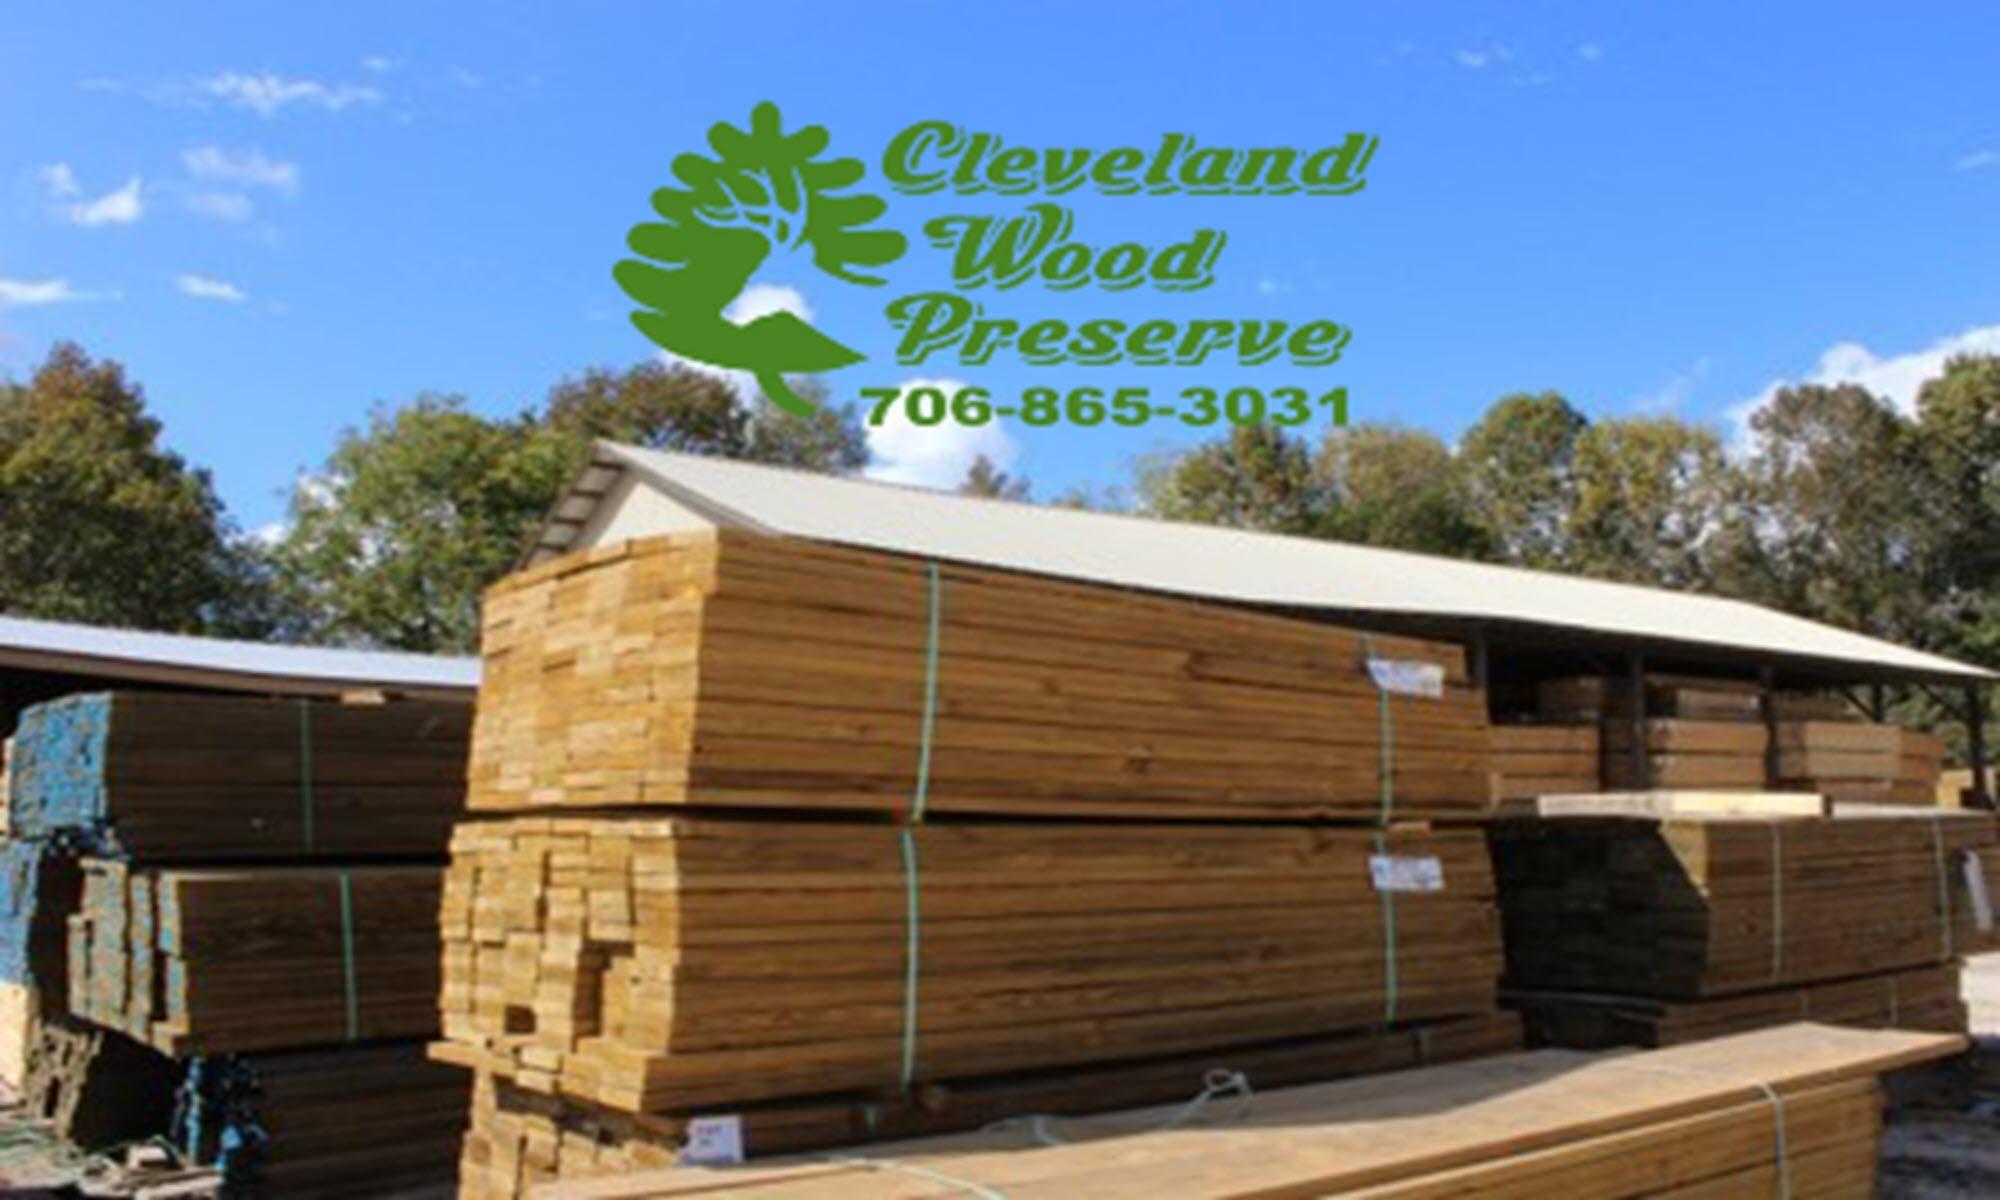 Cleveland Wood Preserve